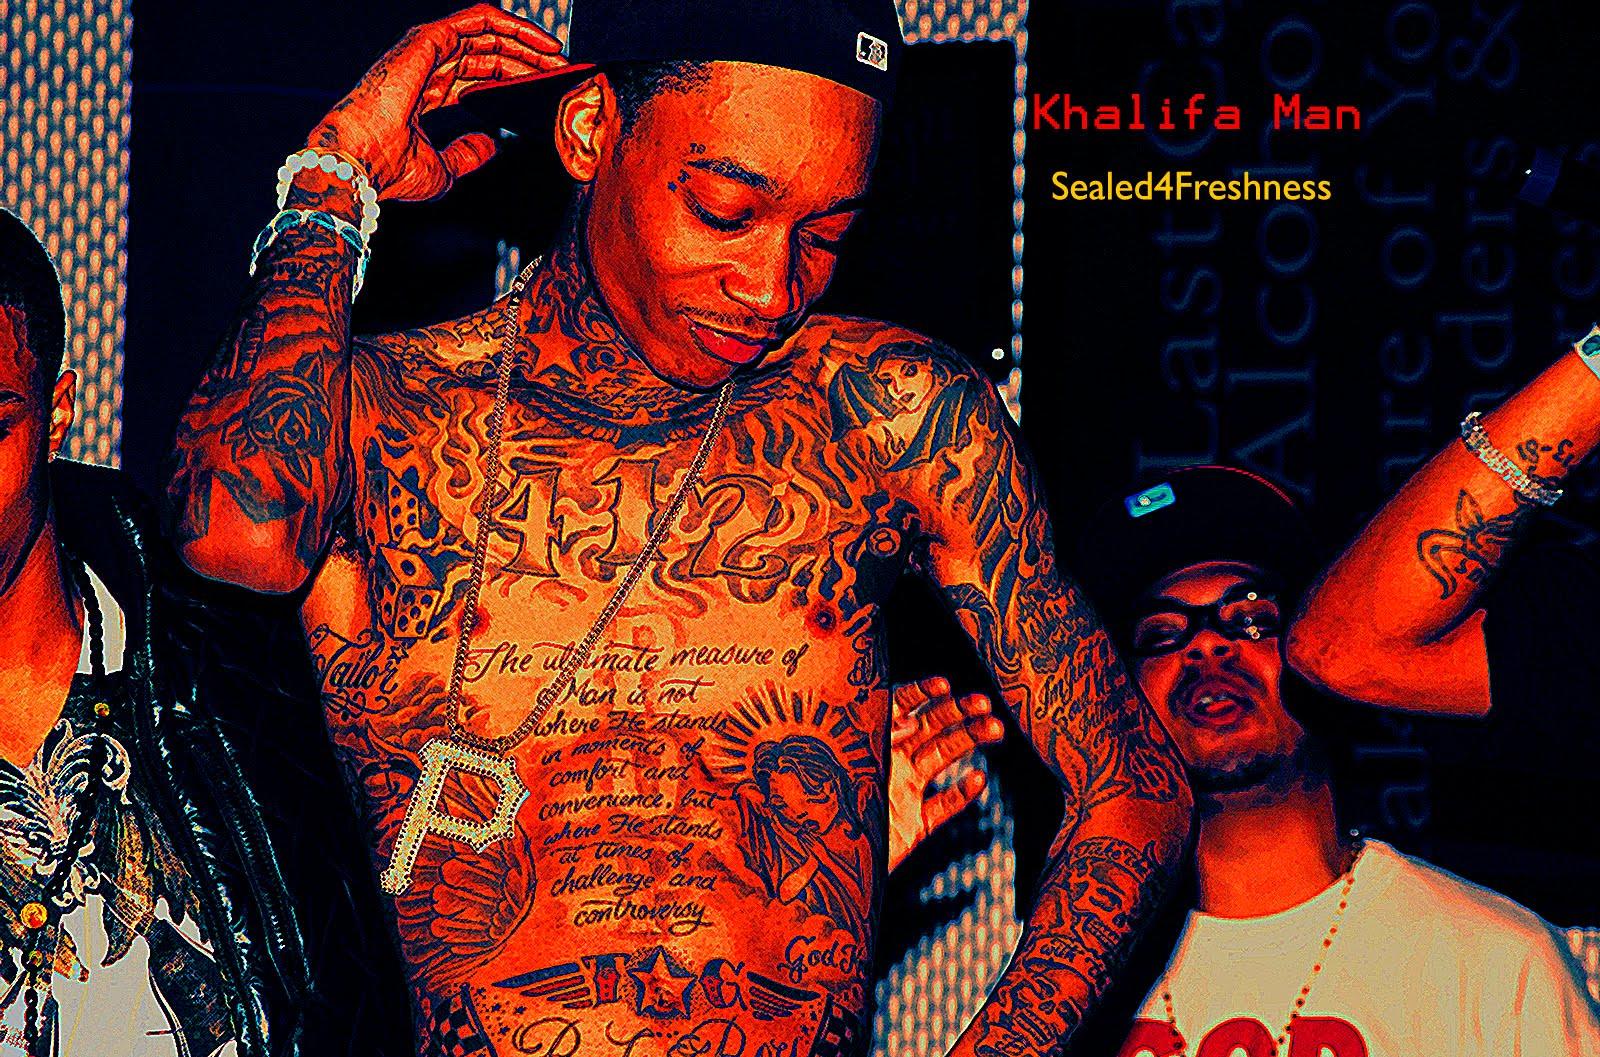 Wiz Khalifa desktop wallpapers screensaver background image photo tats 1600x1057